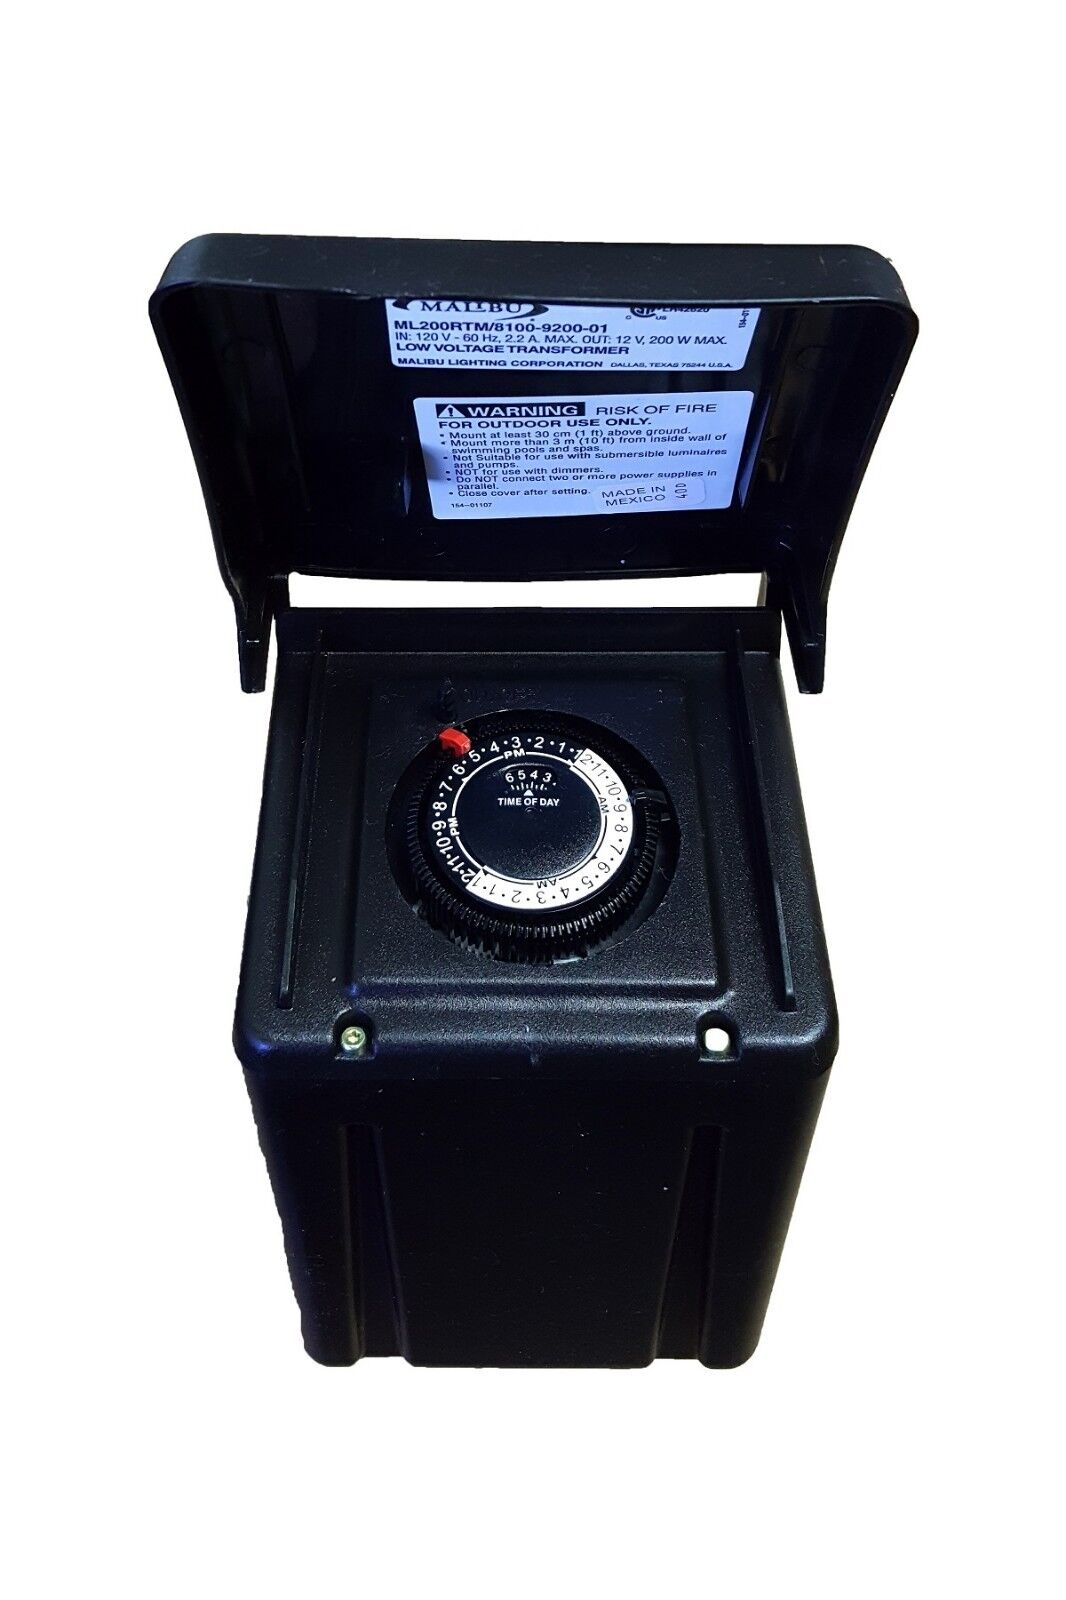 malibu ml200rm 200 watt 12v ac low voltagetransformer timer